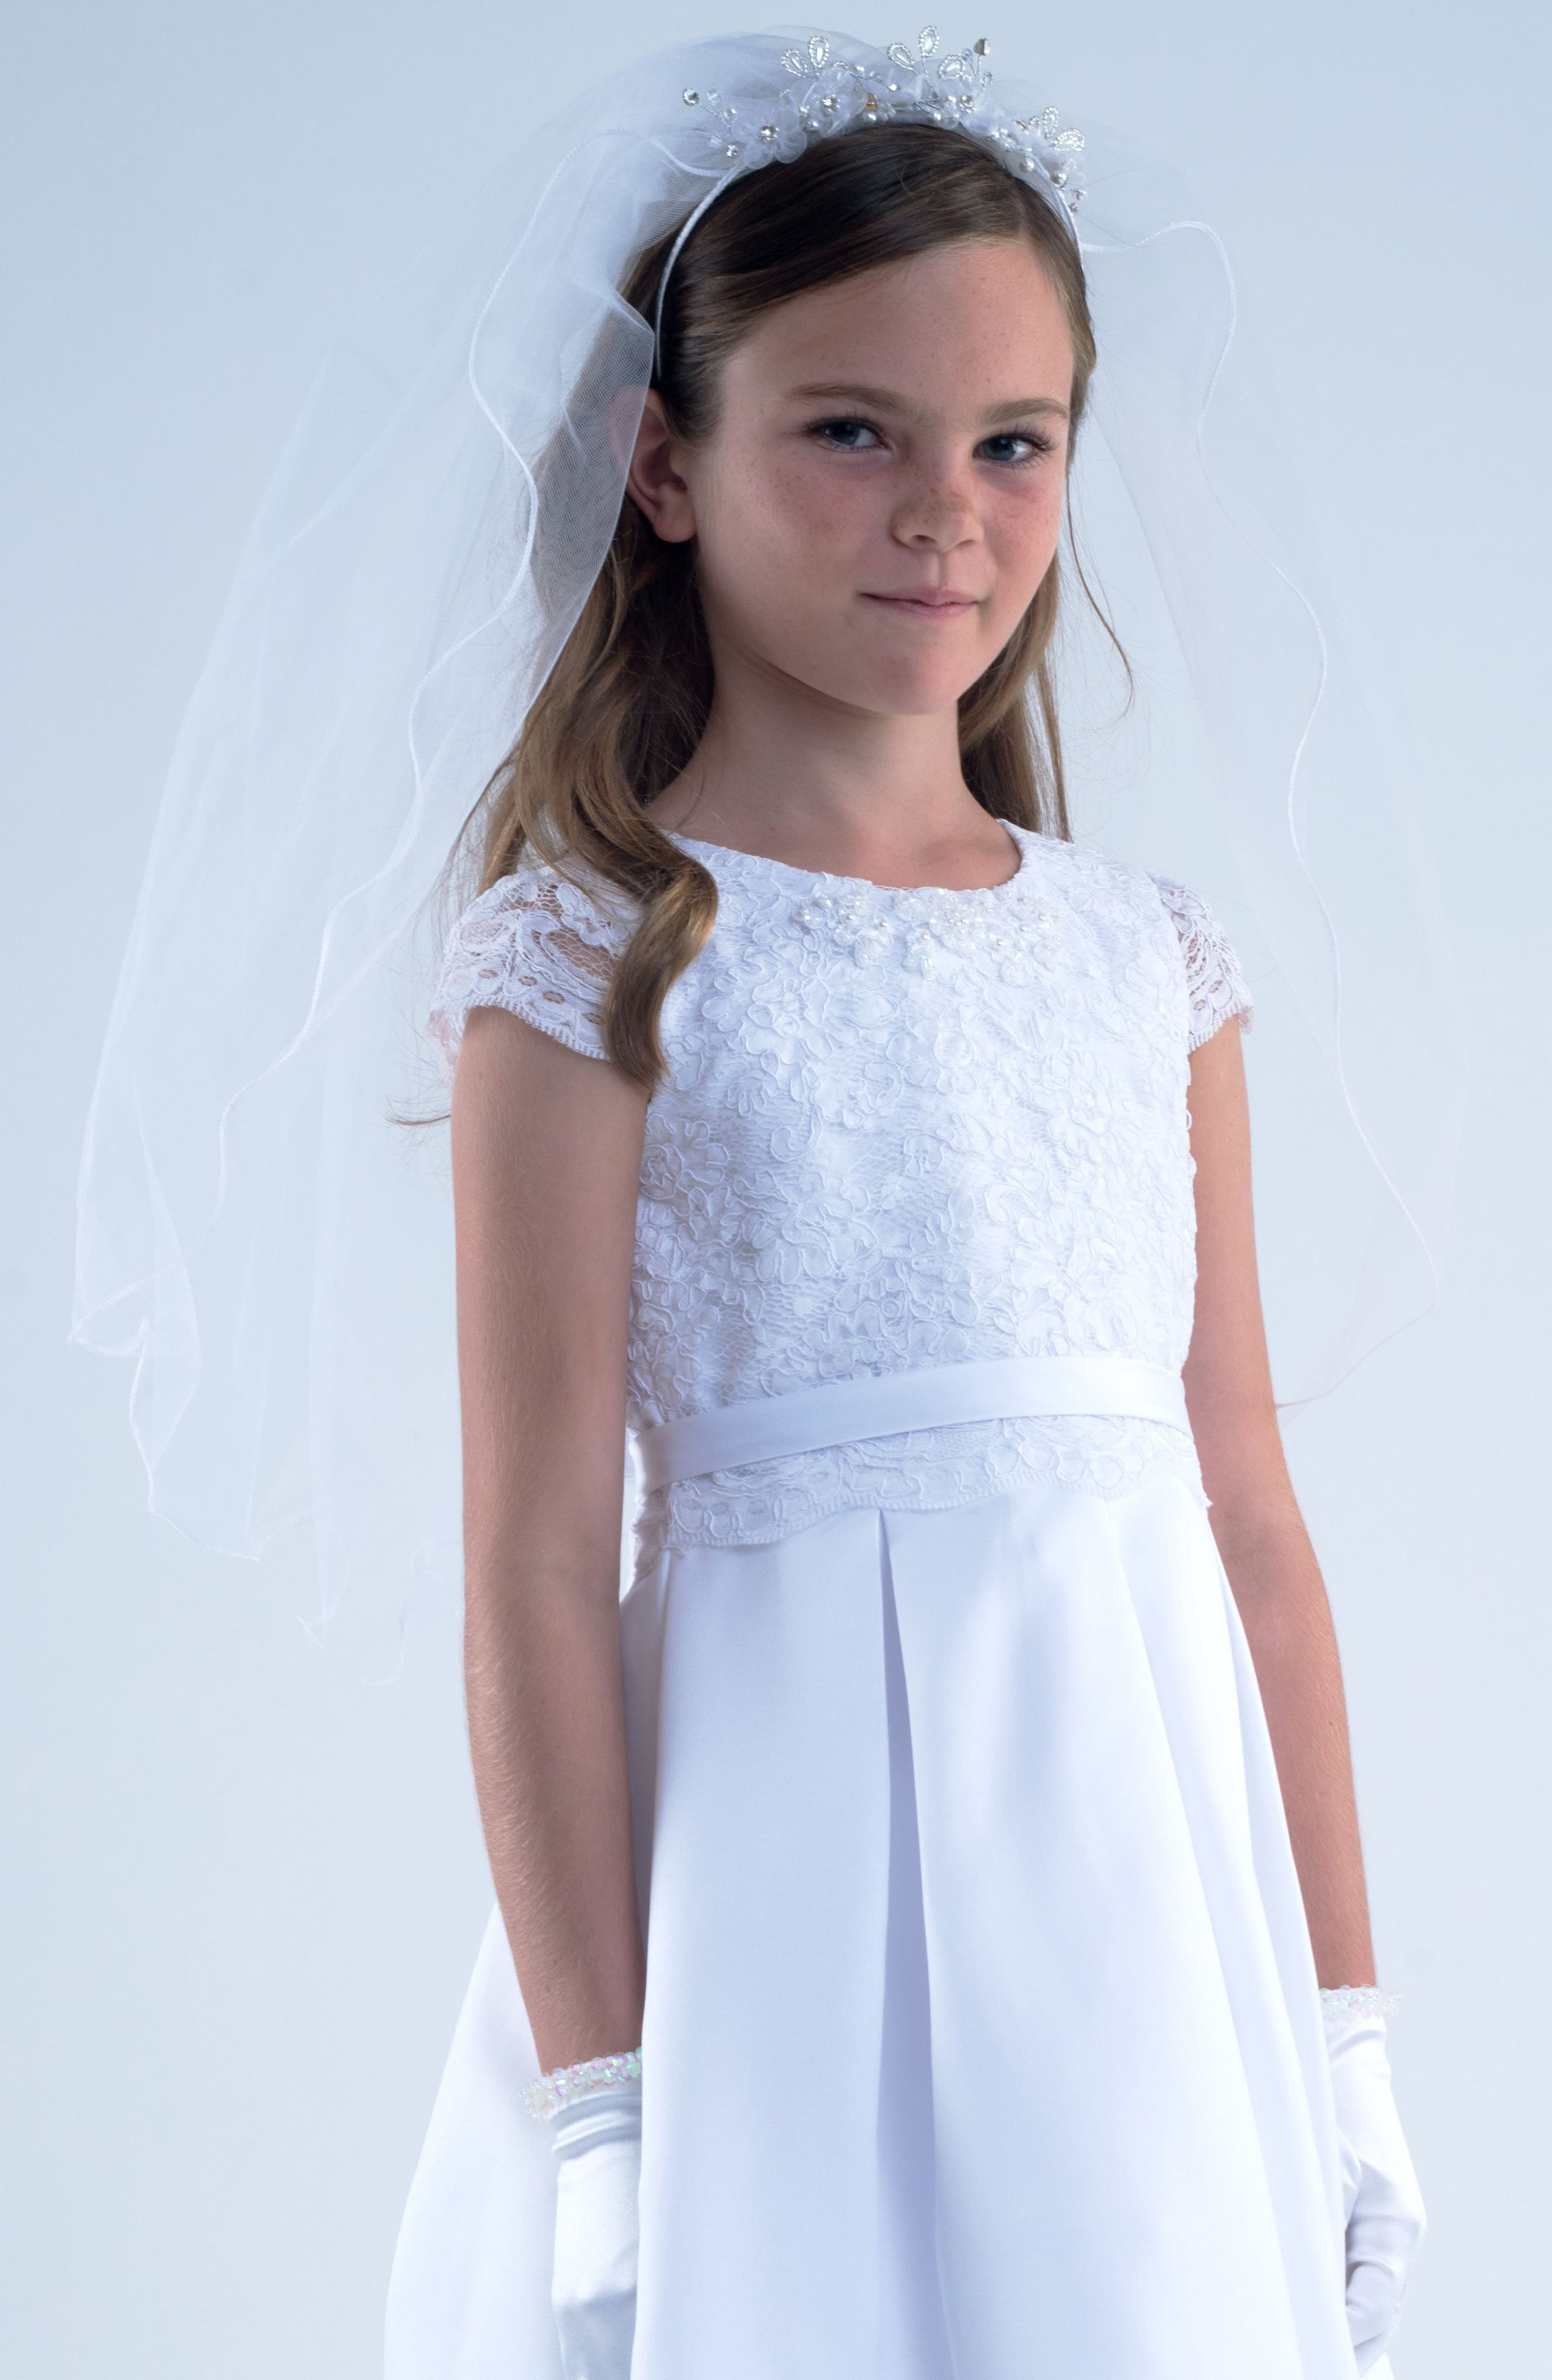 Main Image - Us Angels Tiara with Veil